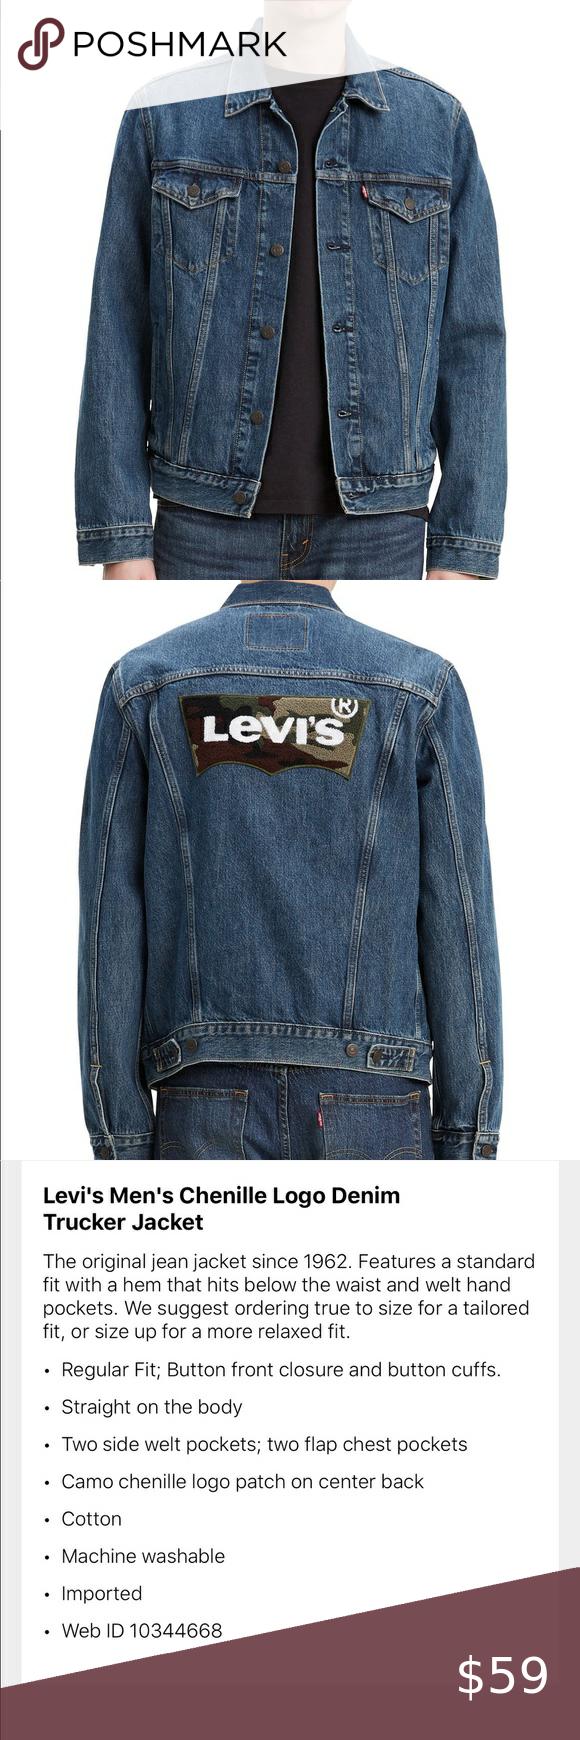 Levi S Mens Trucker Denim Camo Jean Jacket L Camo Jeans Levi Jackets [ 1740 x 580 Pixel ]